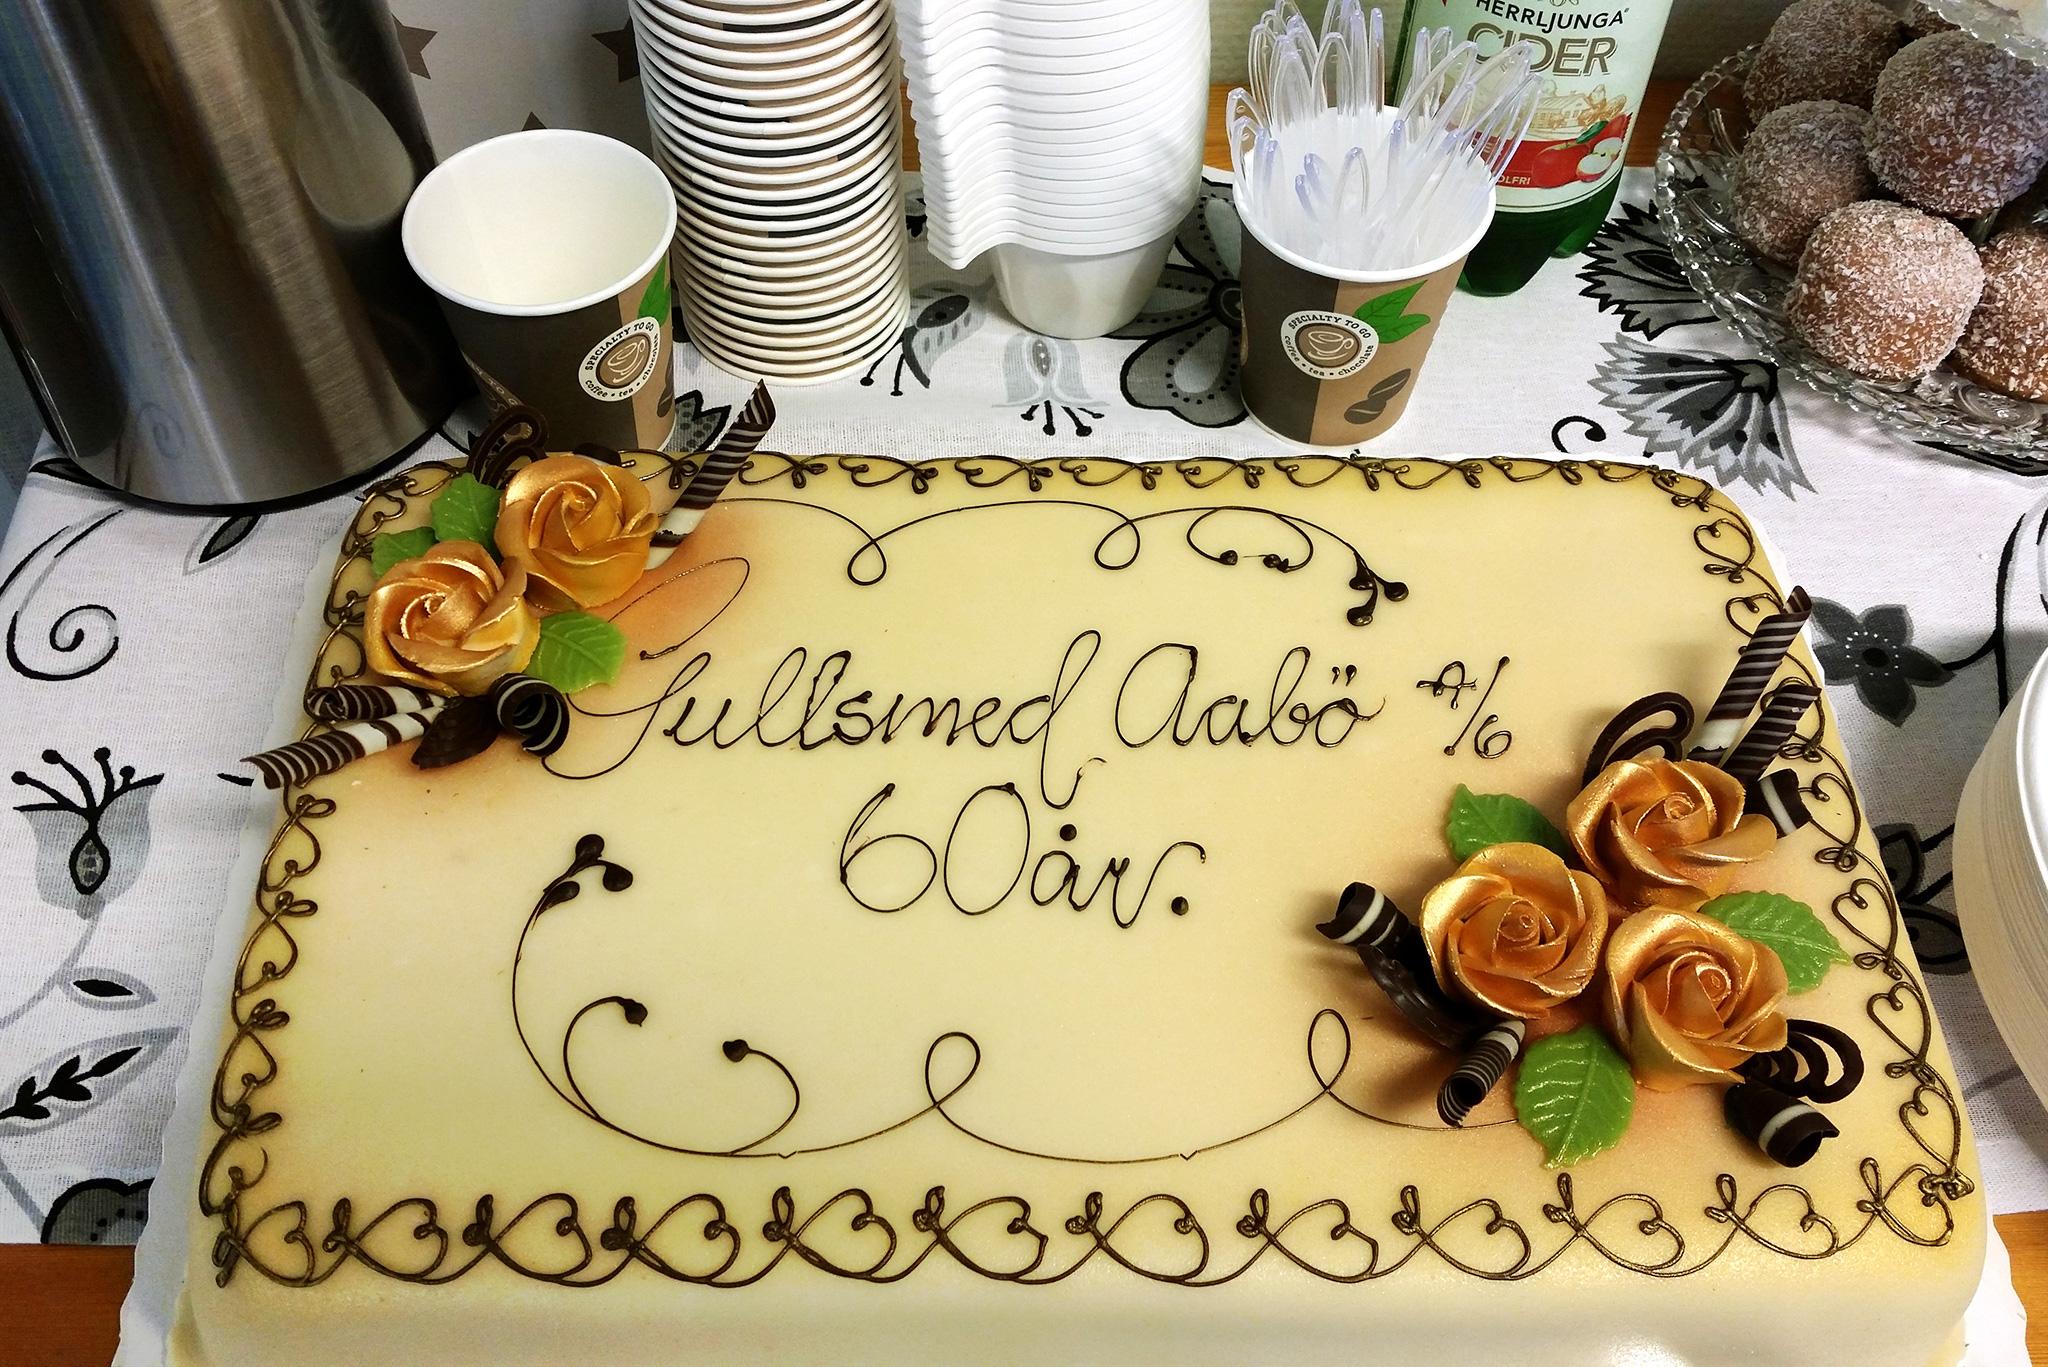 Gullsmed Aabø 60 år! Hurra!